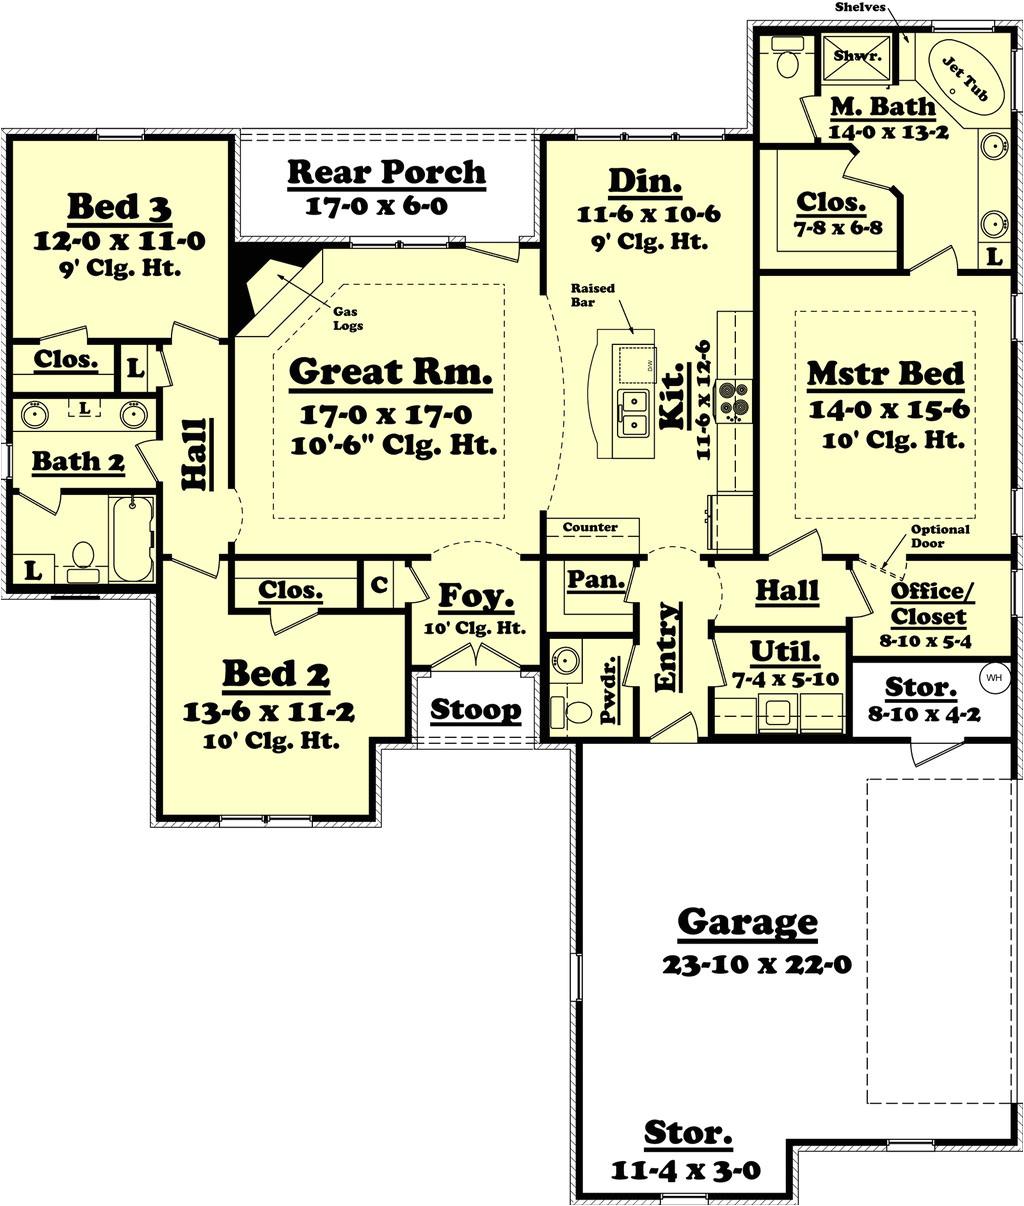 1800 square feet 3 bedrooms 2 5 bathroom european house plans 2 garage 36452